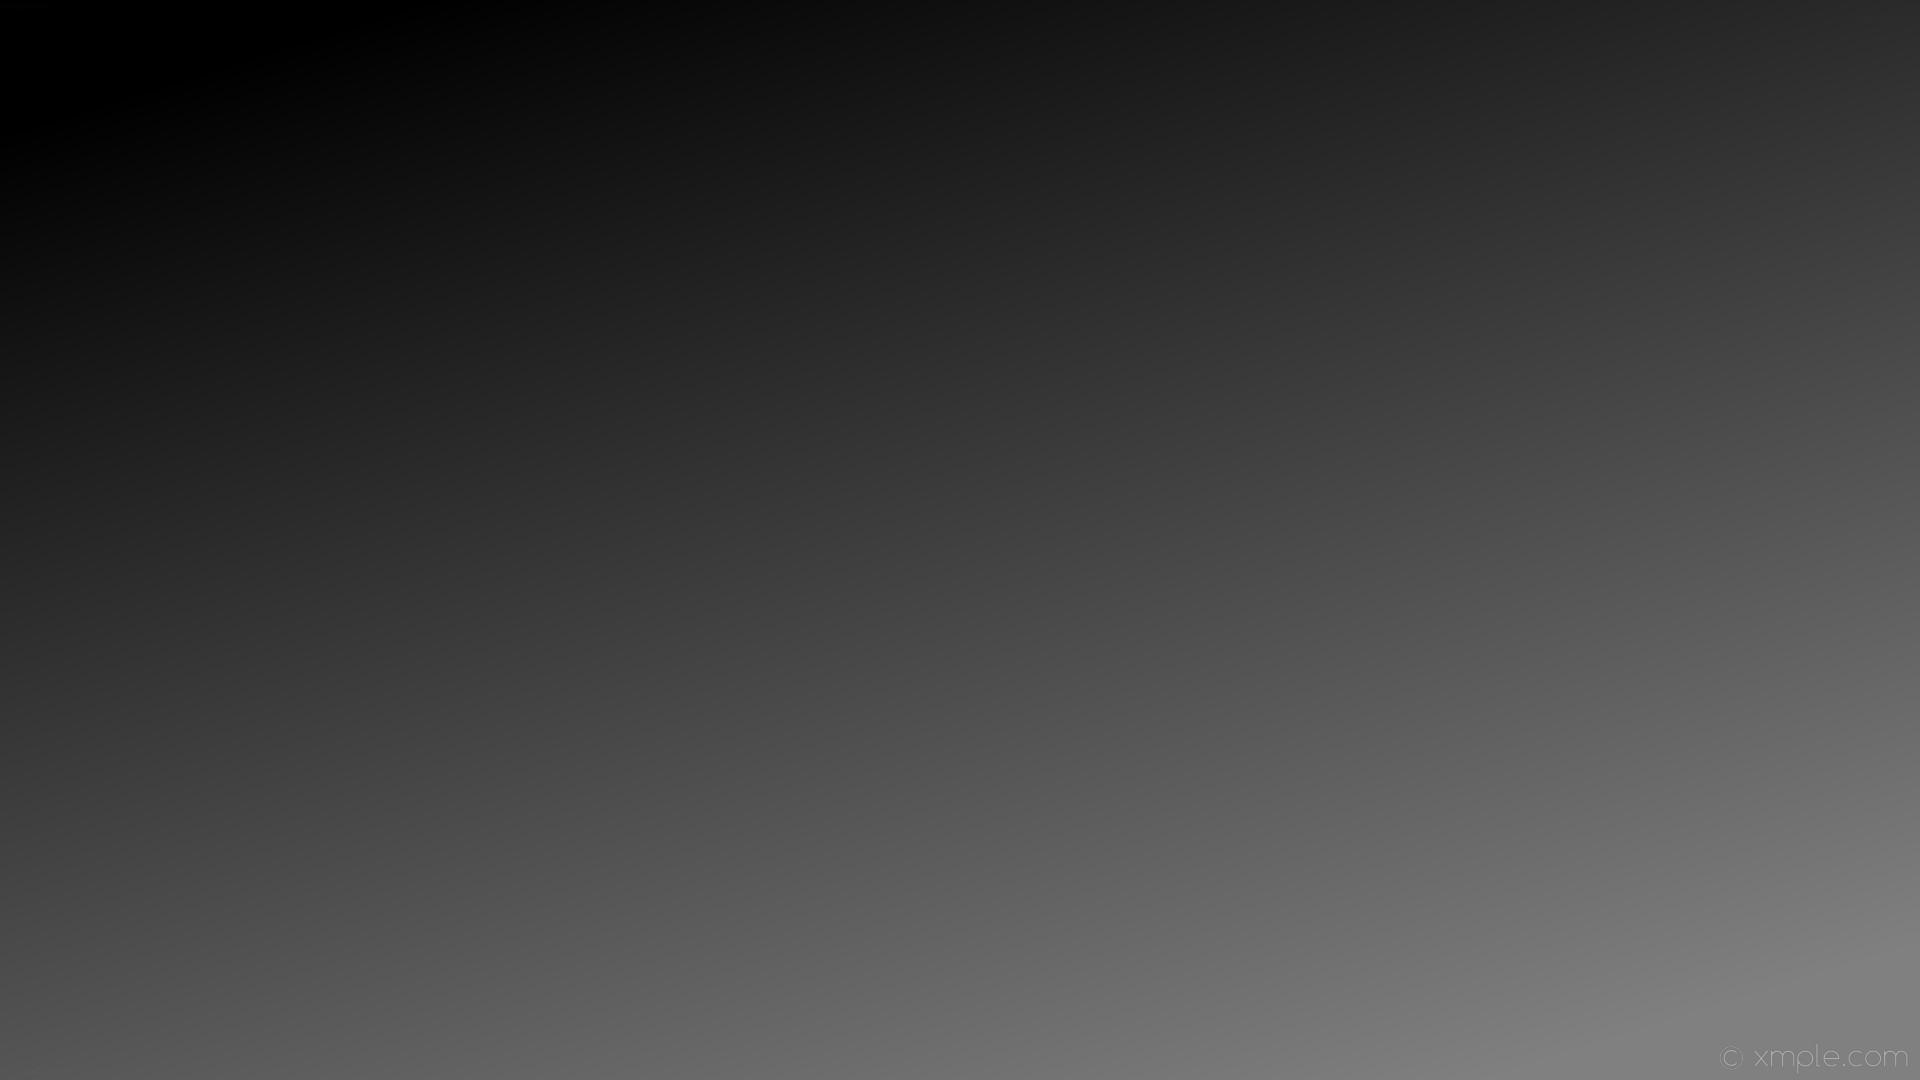 wallpaper grey black gradient linear gray #808080 #000000 315°